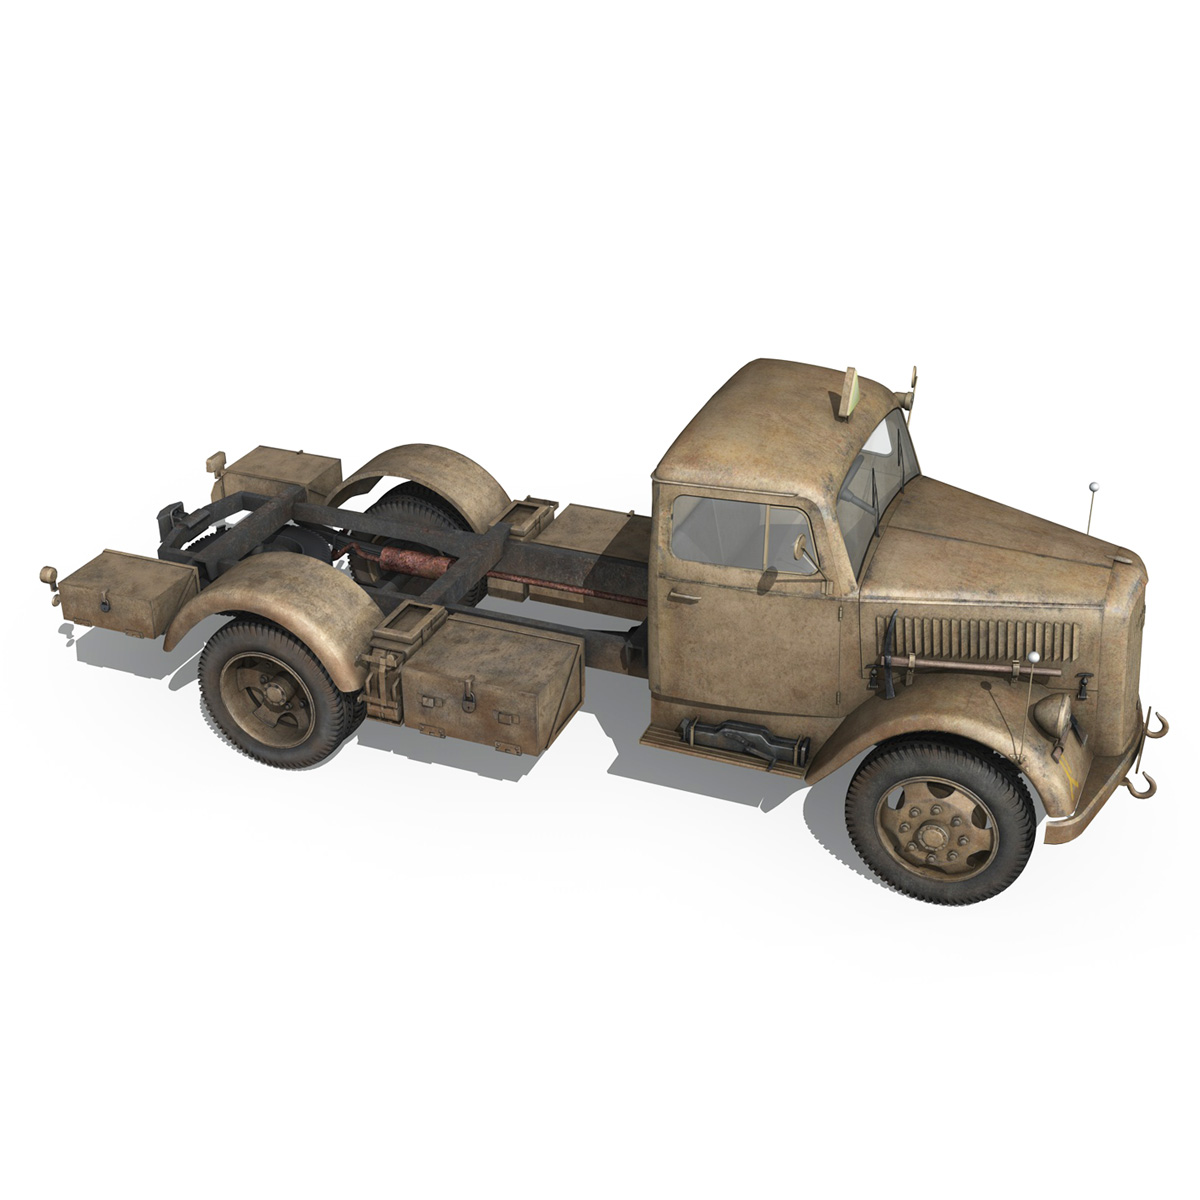 opel blitz – 3t ambulance truck – 2 pzdiv 3d model 3ds c4d fbx lwo lw lws obj 265762